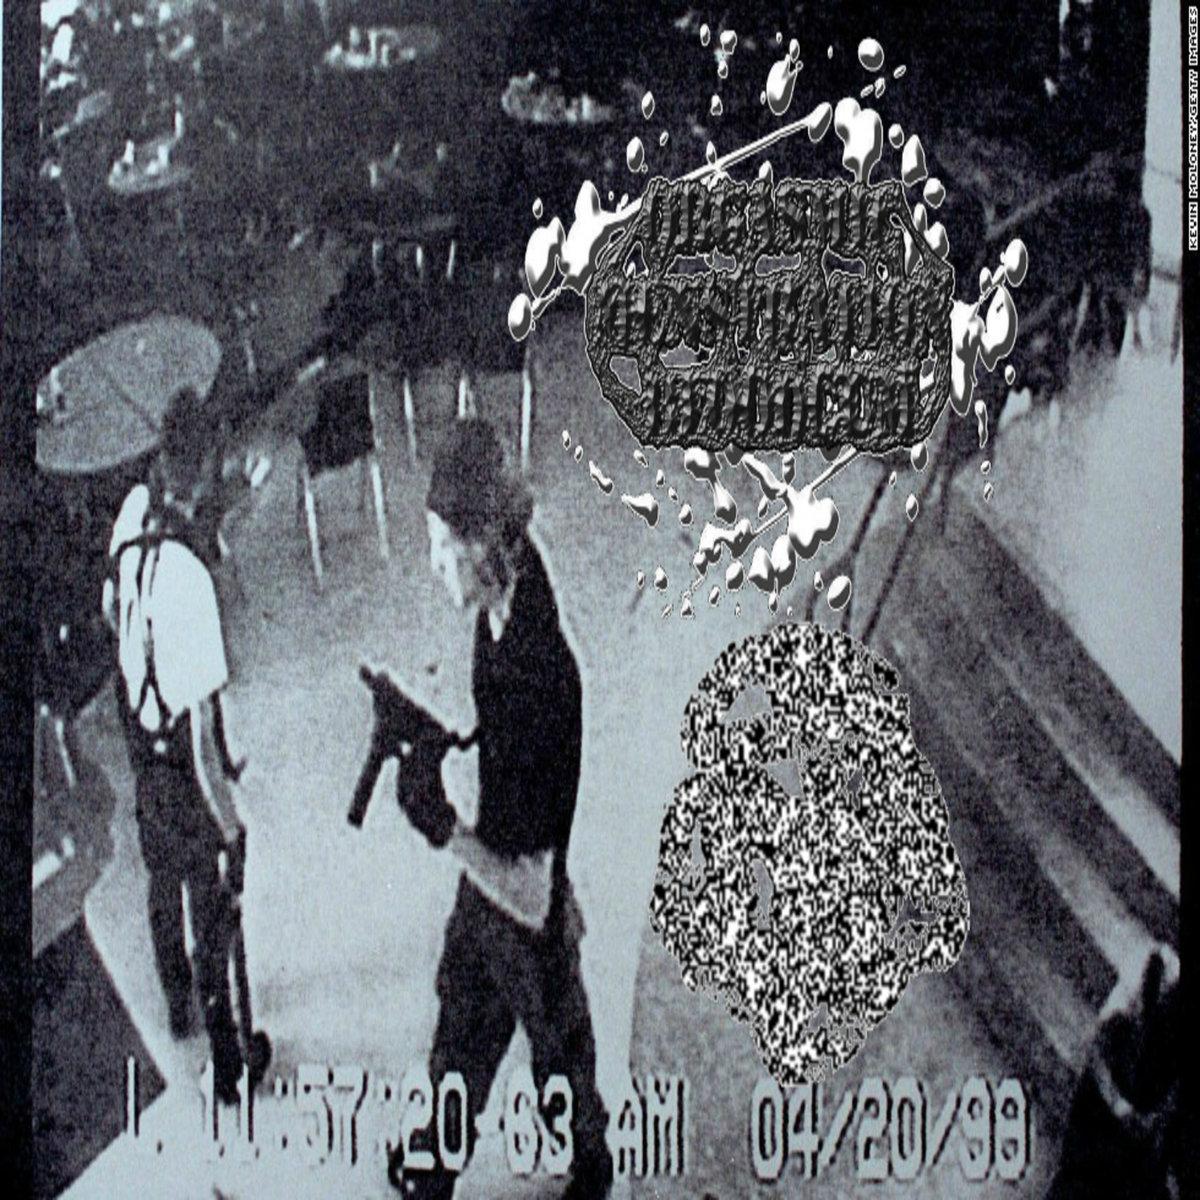 Columbine High School Stock Photos Columbine High School: Basement Tapes Of Columbine (2 Way Split)